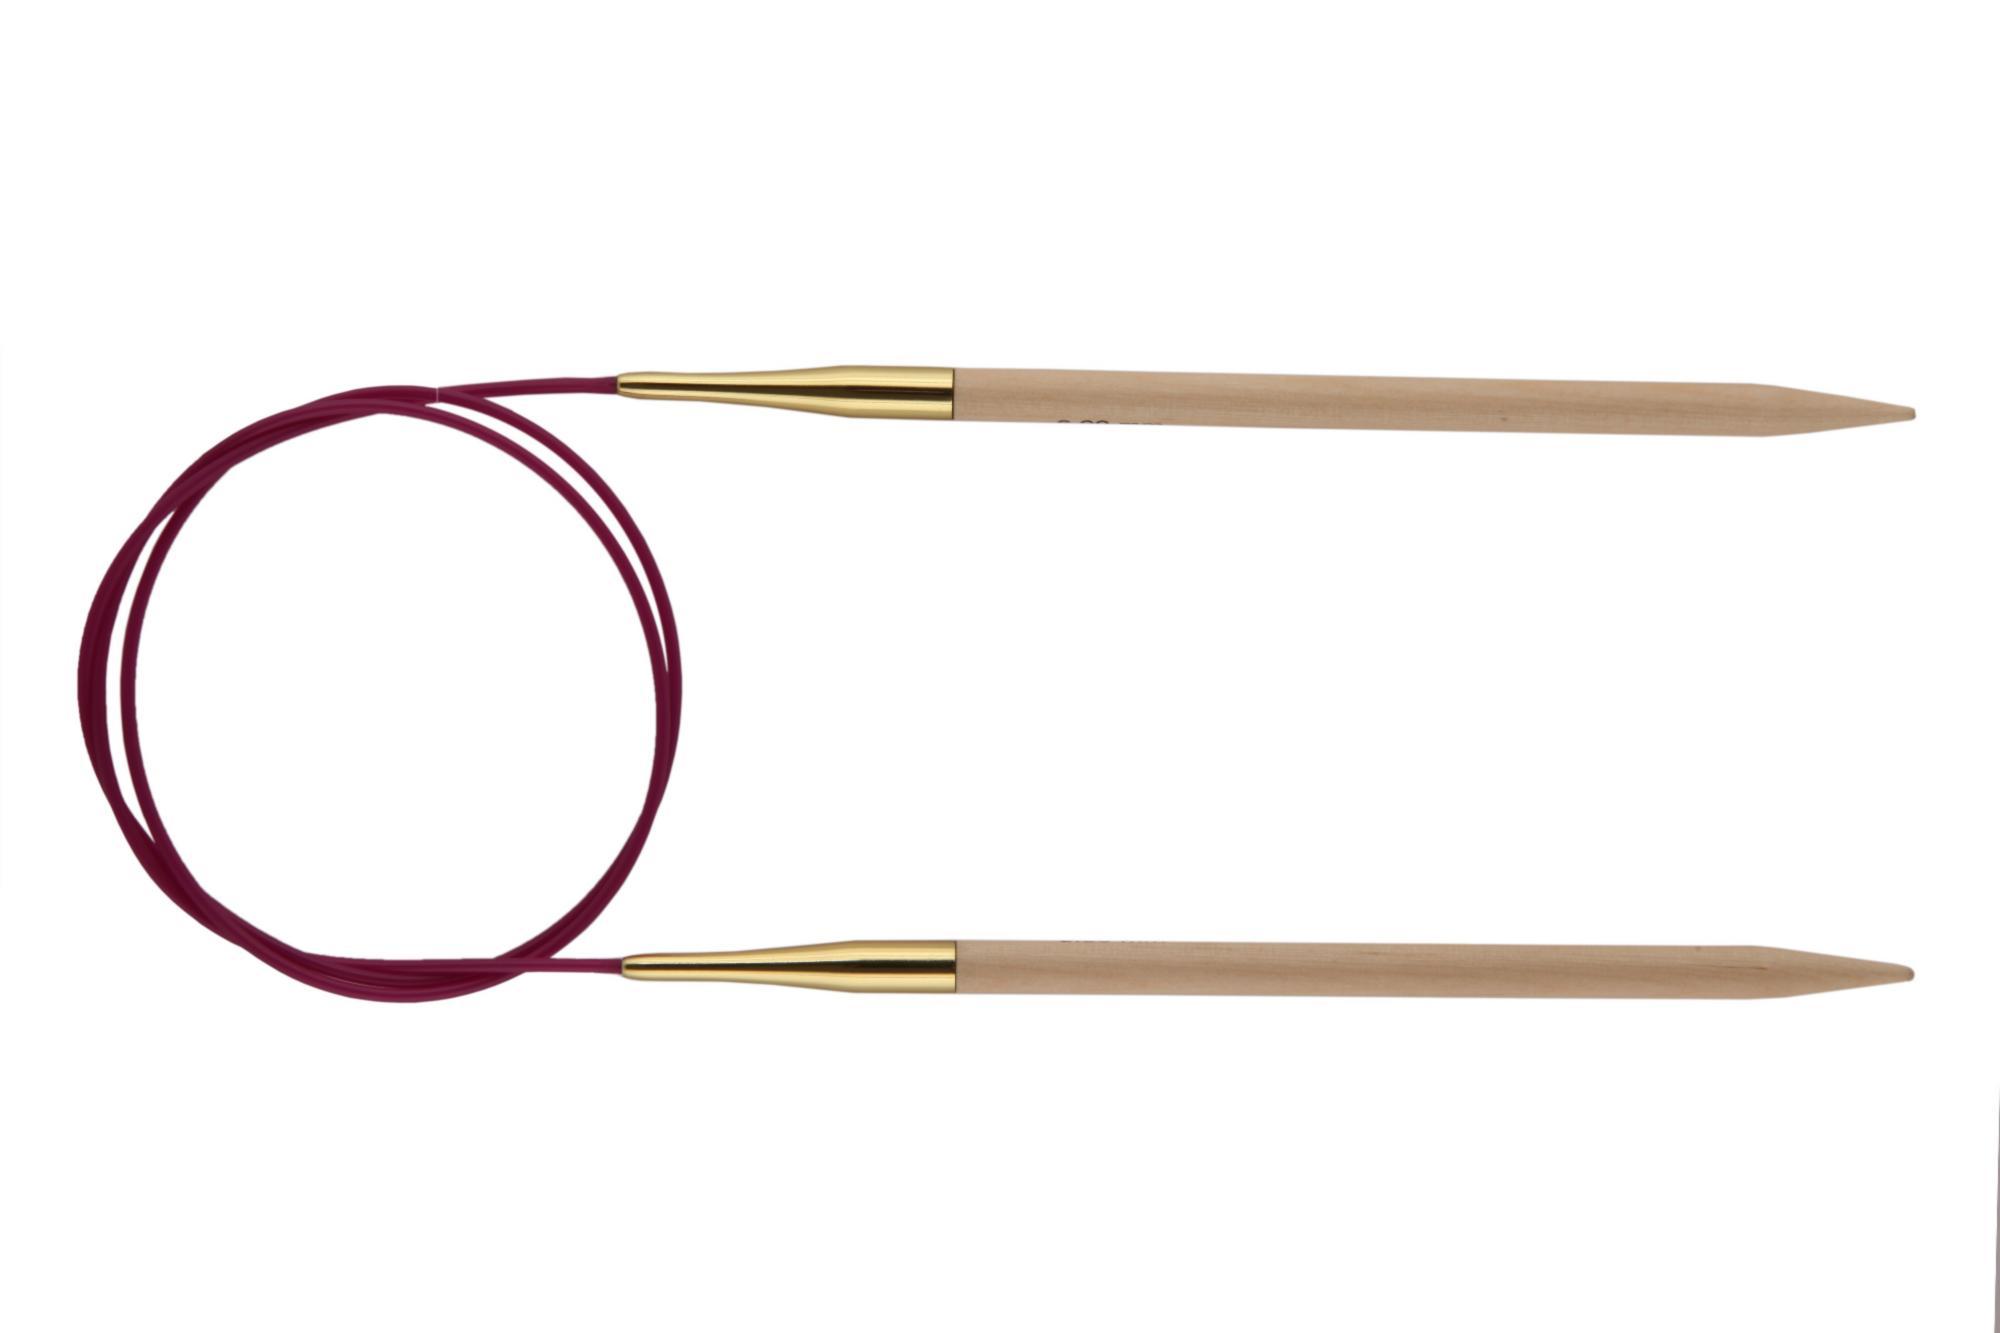 Спицы круговые 80 см Basix Birch Wood KnitPro, 35383, 3.75 мм